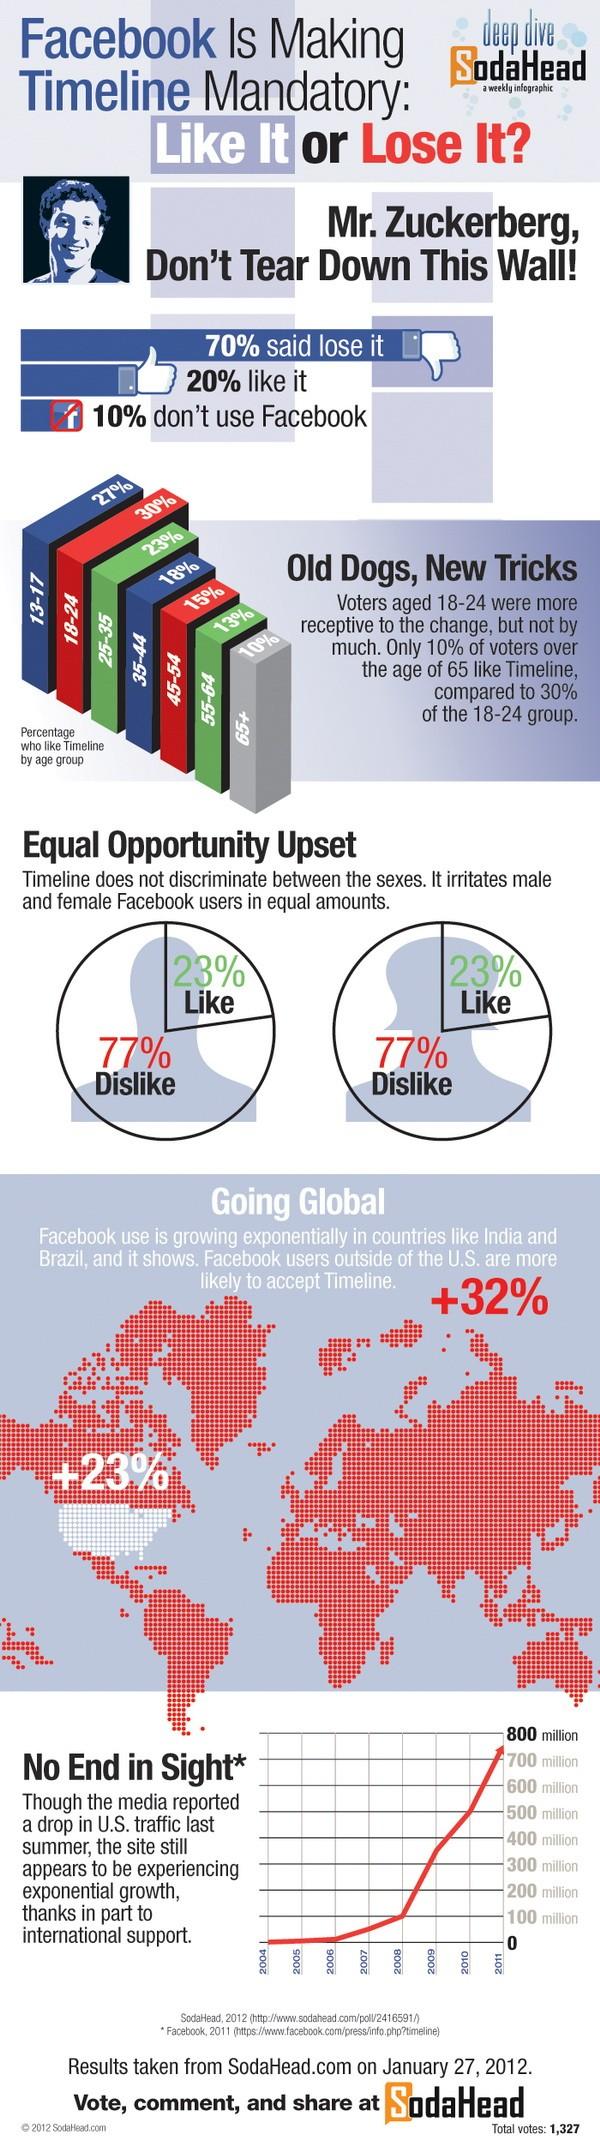 facebook-timeline-like-it-or-lose-it